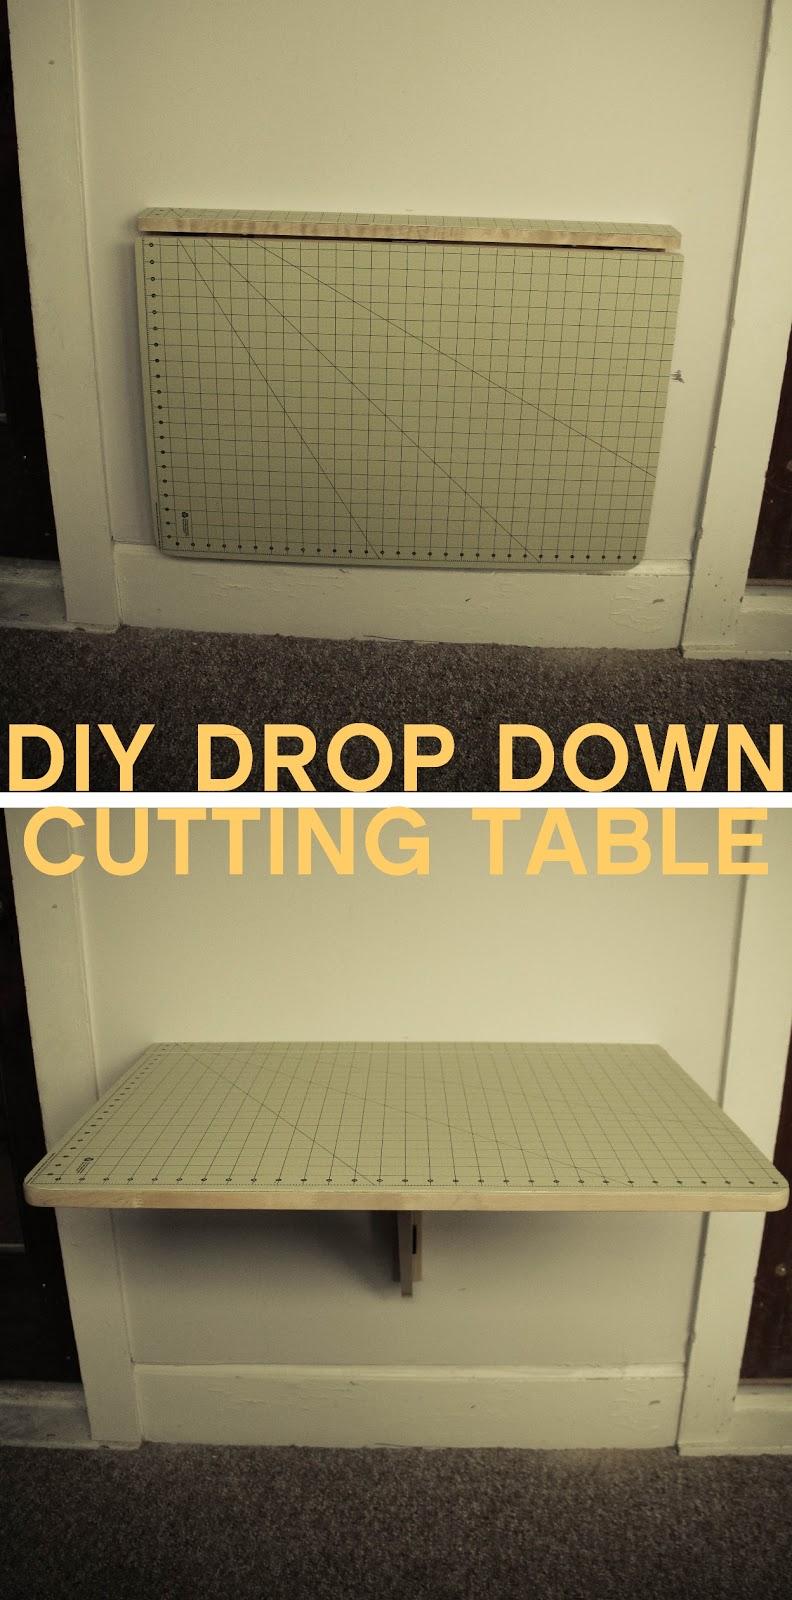 Grosgrain Diy Drop Down Cutting Table